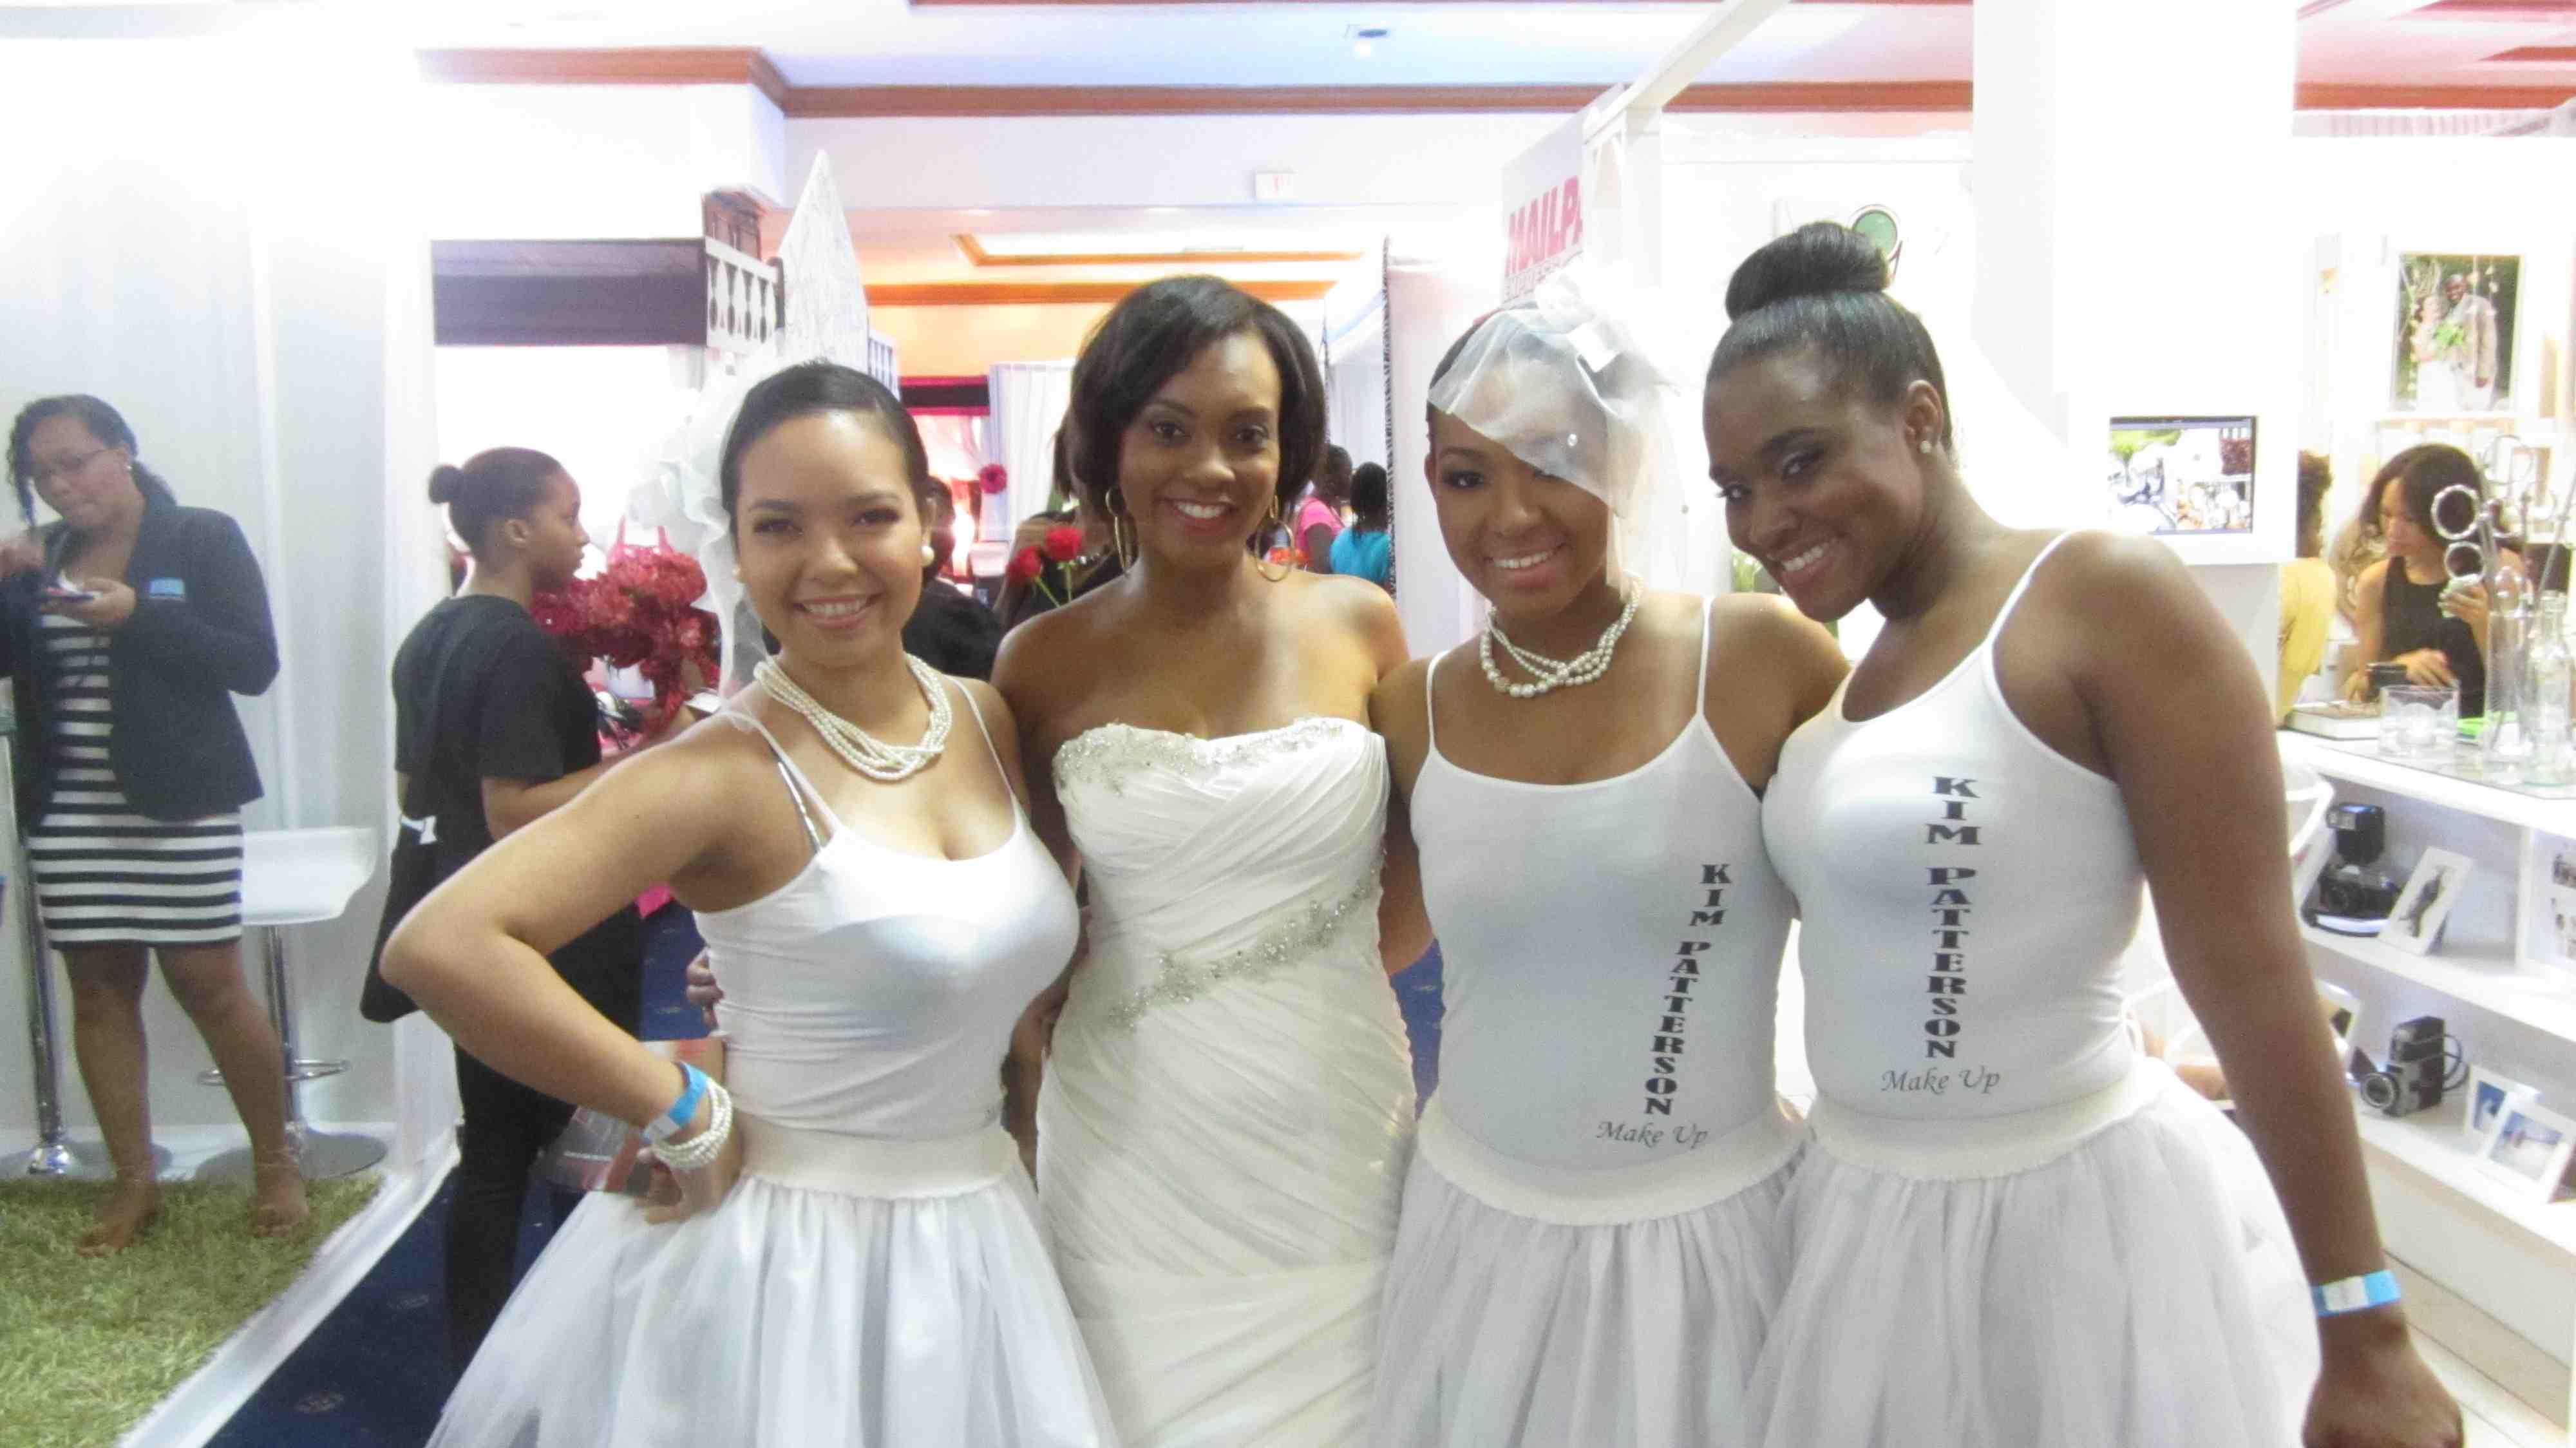 Destination Weddings: Big Business in Kingston, Jamaica | HuffPost